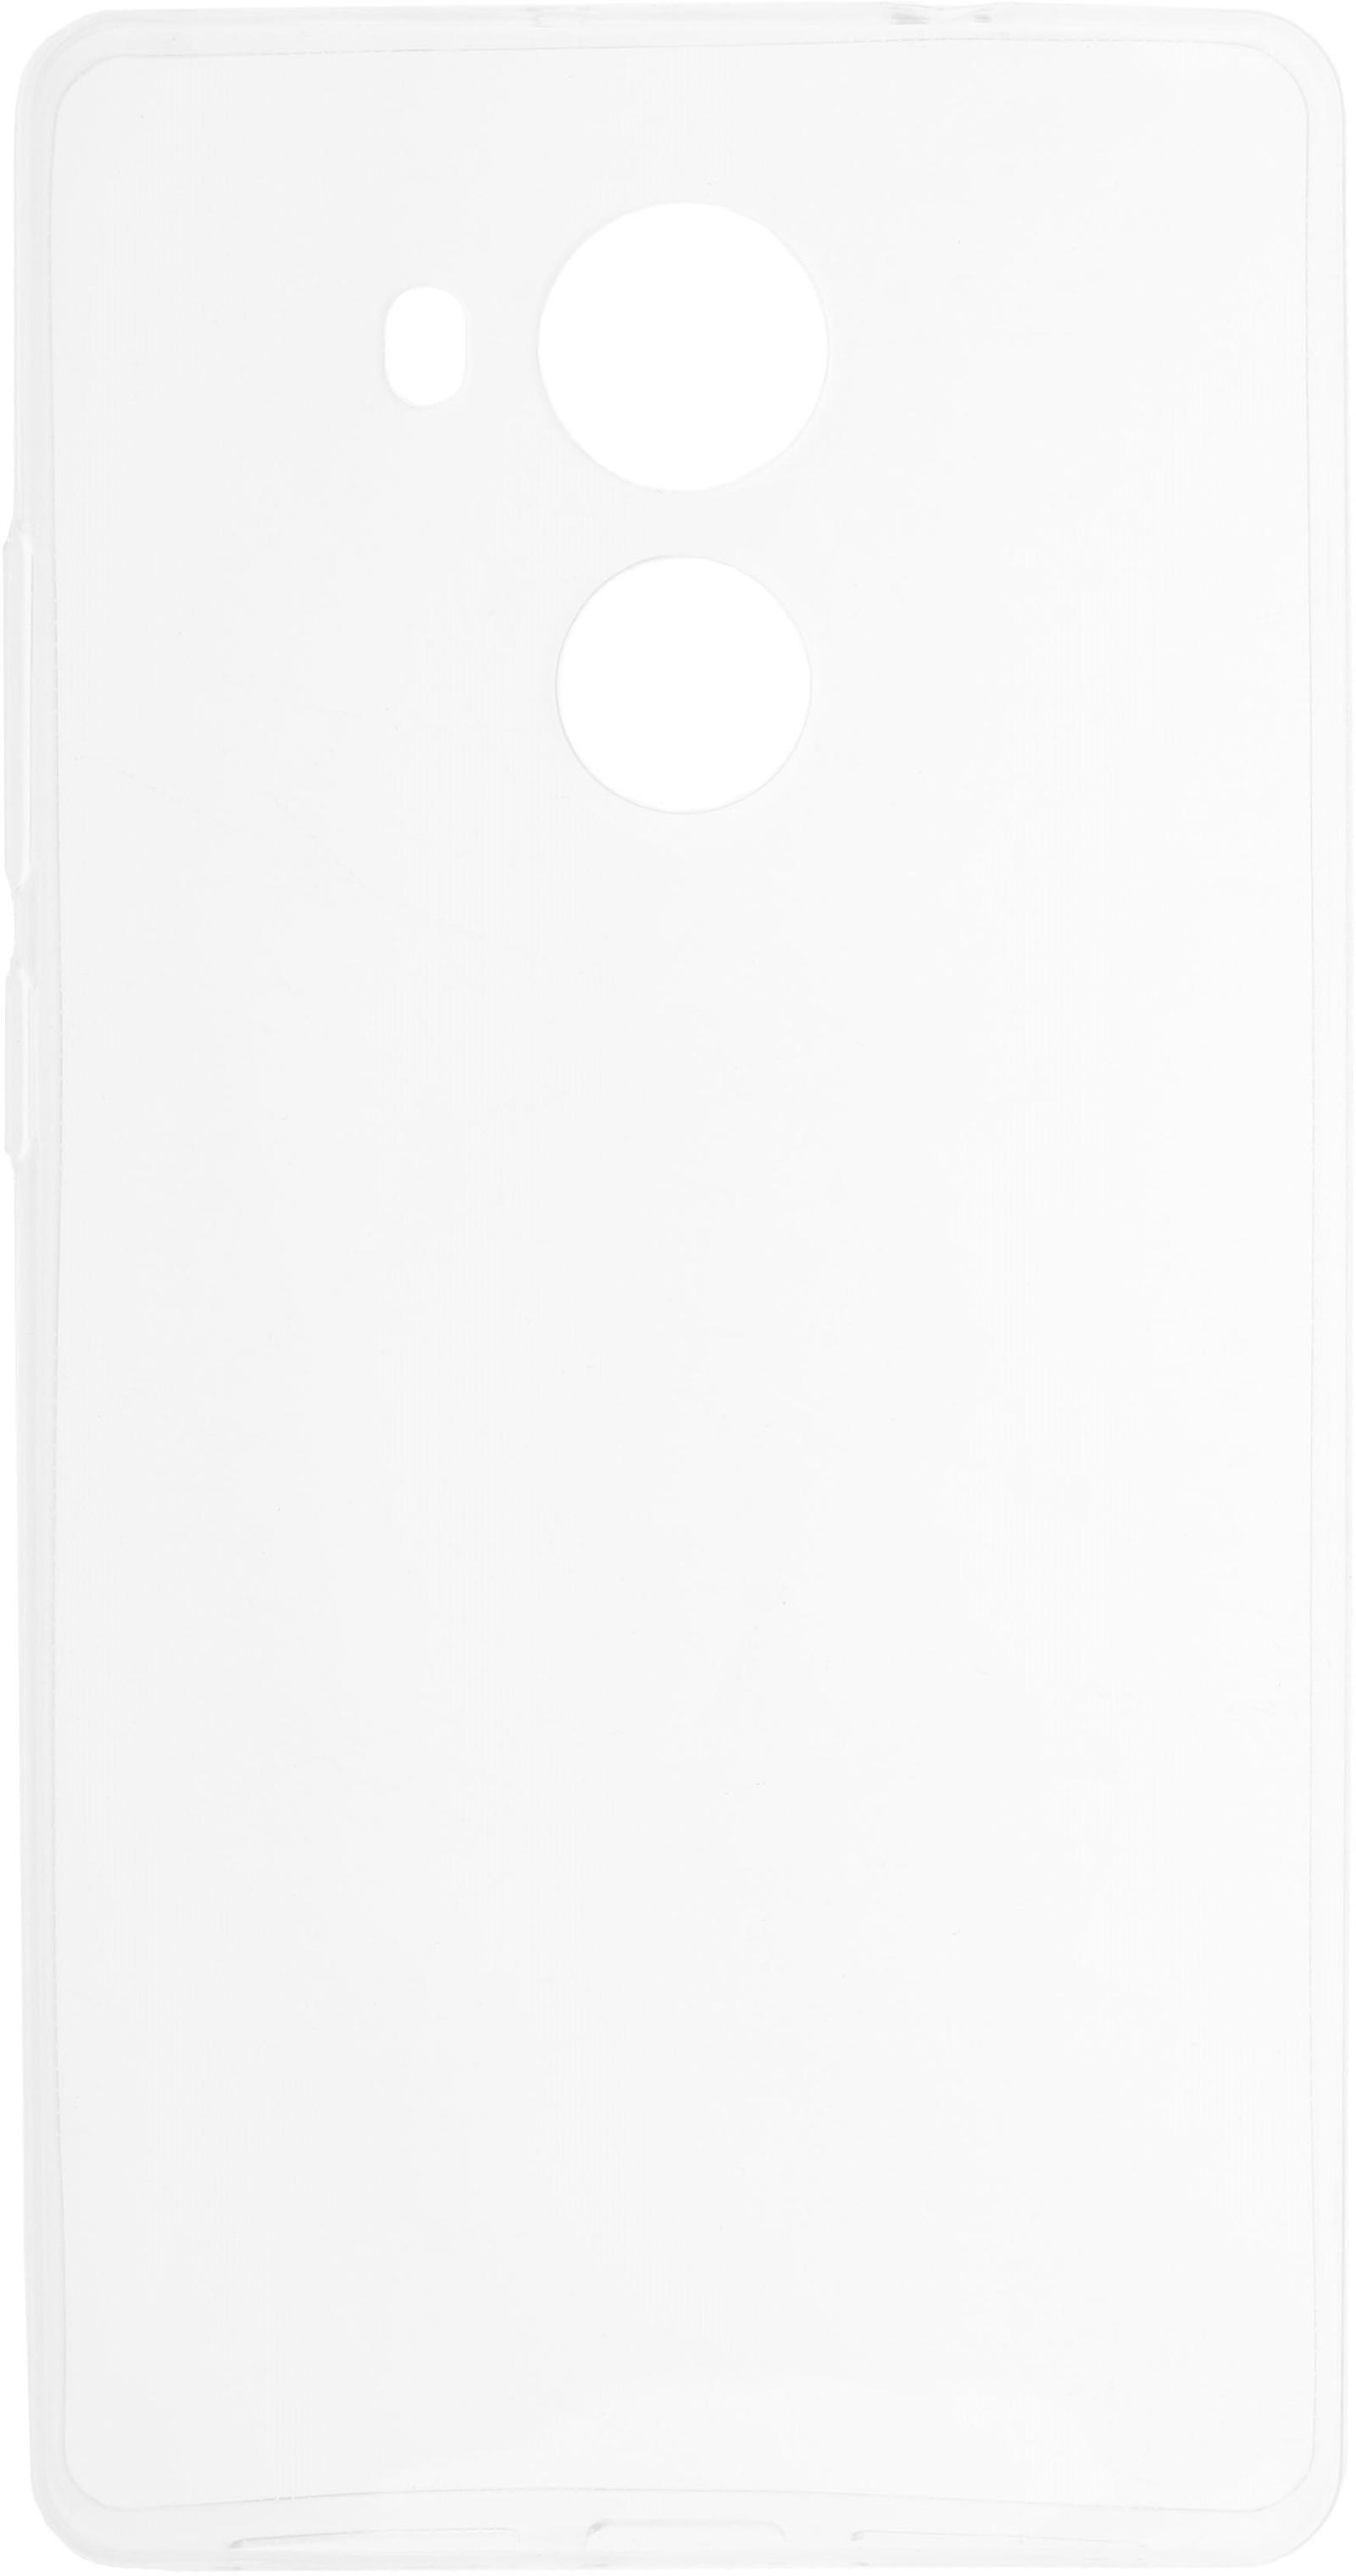 Чехол для сотового телефона skinBOX Slim Silicone, 4630042527829, прозрачный цена и фото